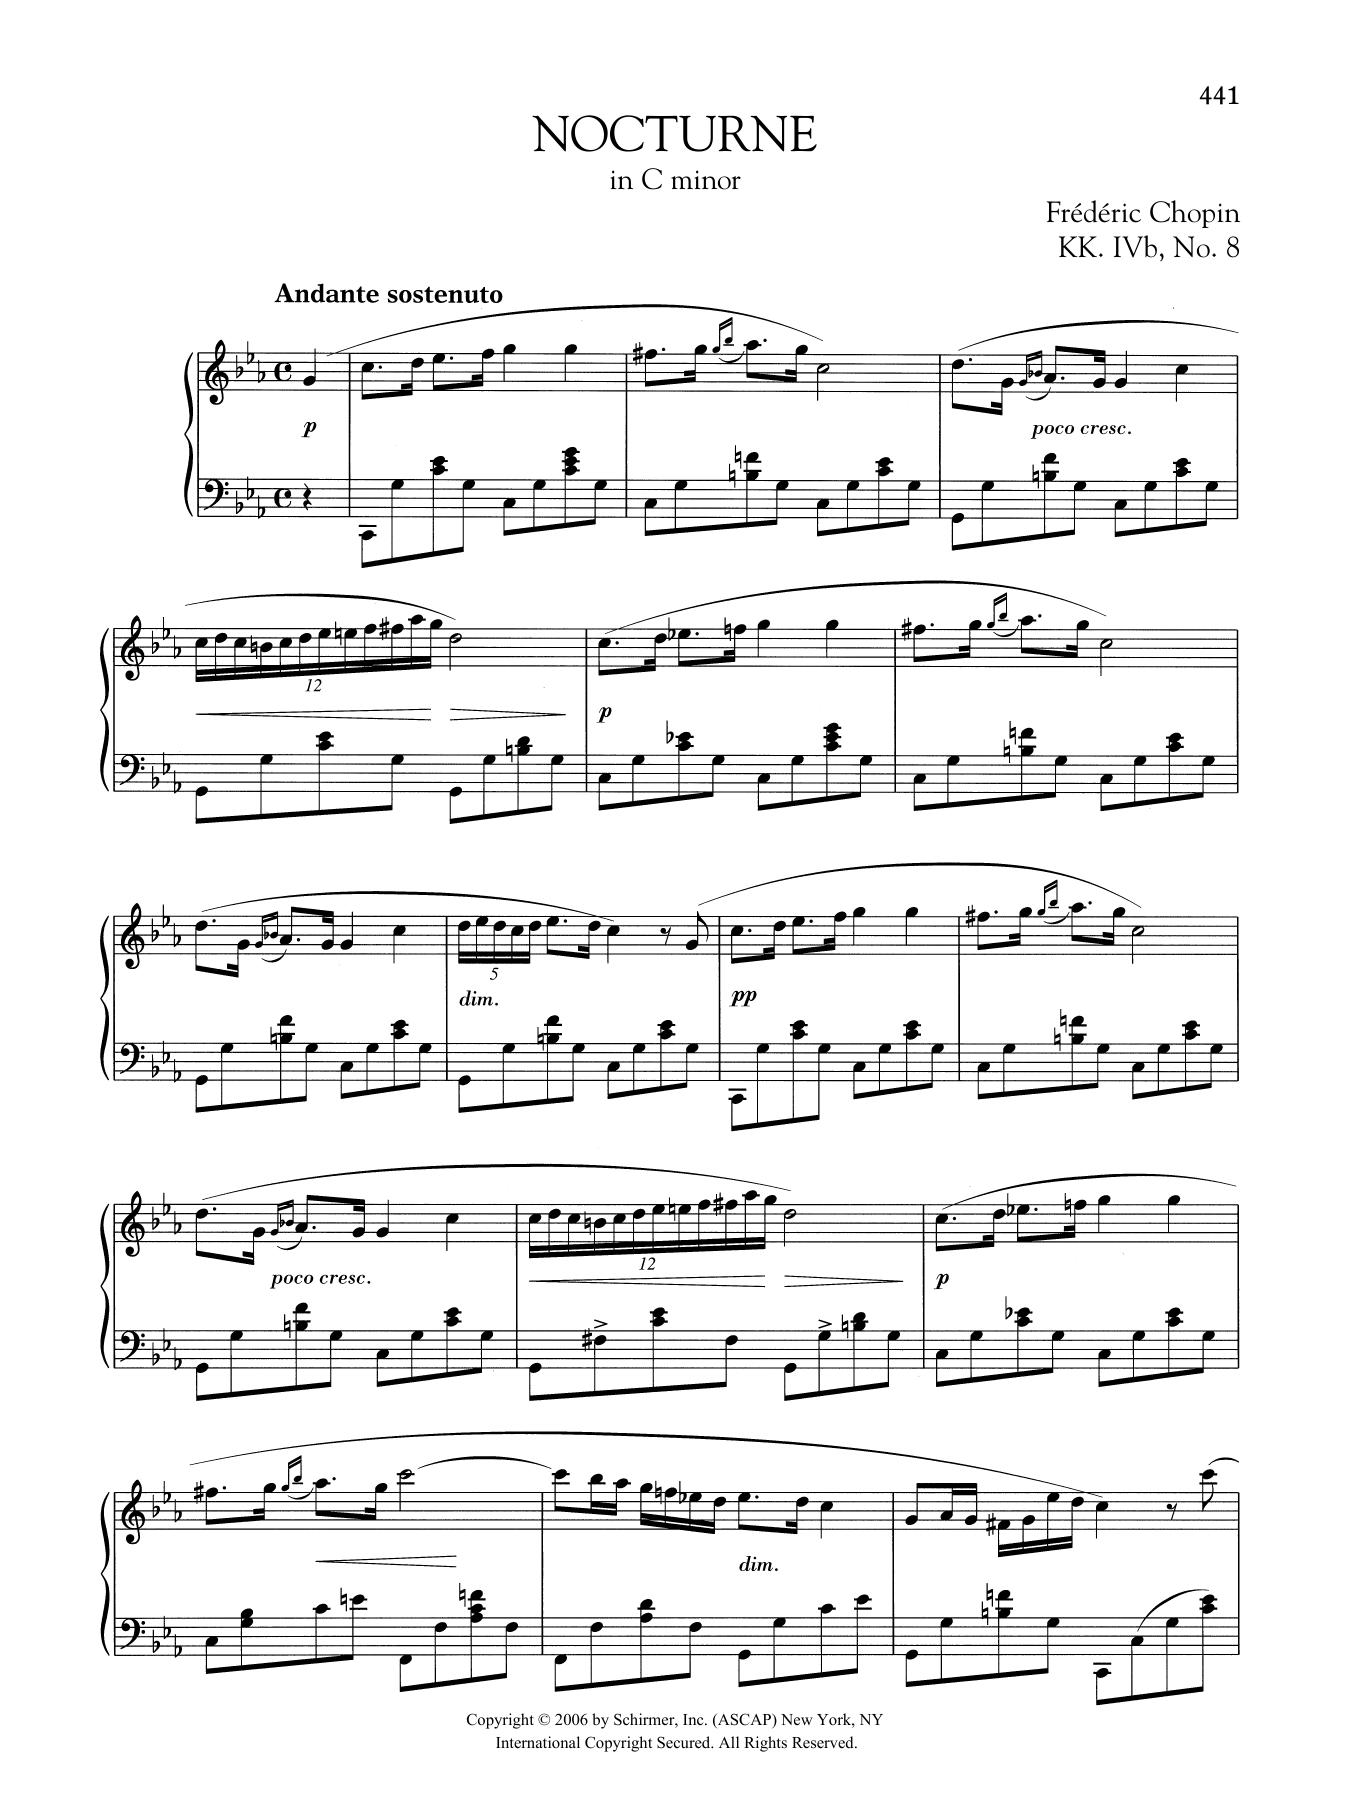 Nocturne in C minor, KK. IVb, No. 8 Sheet Music